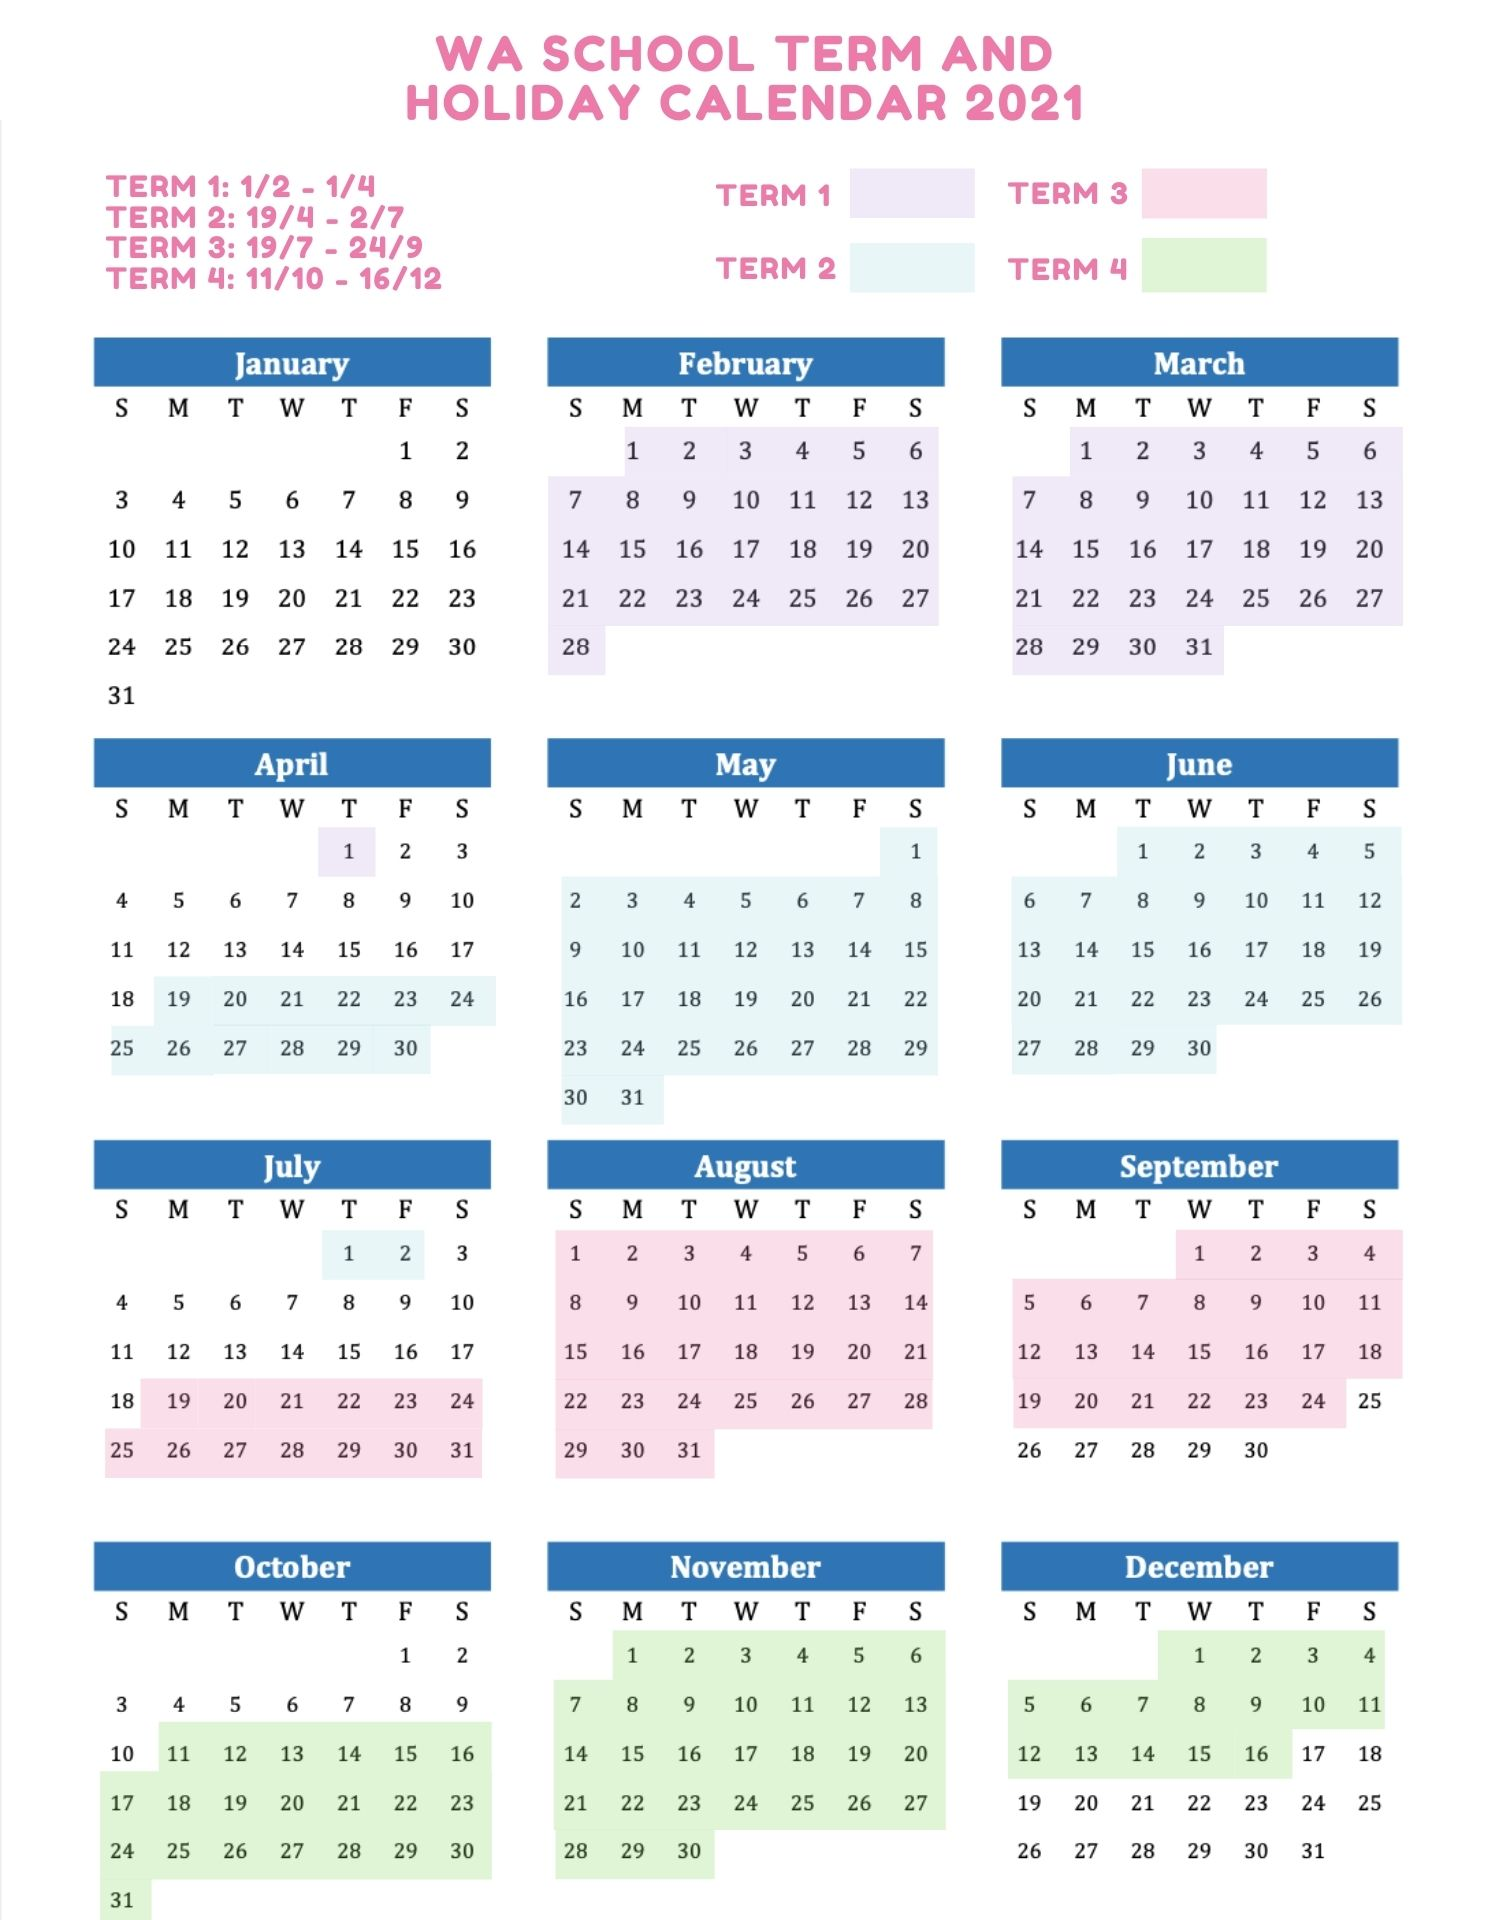 WA School Holidays 2021